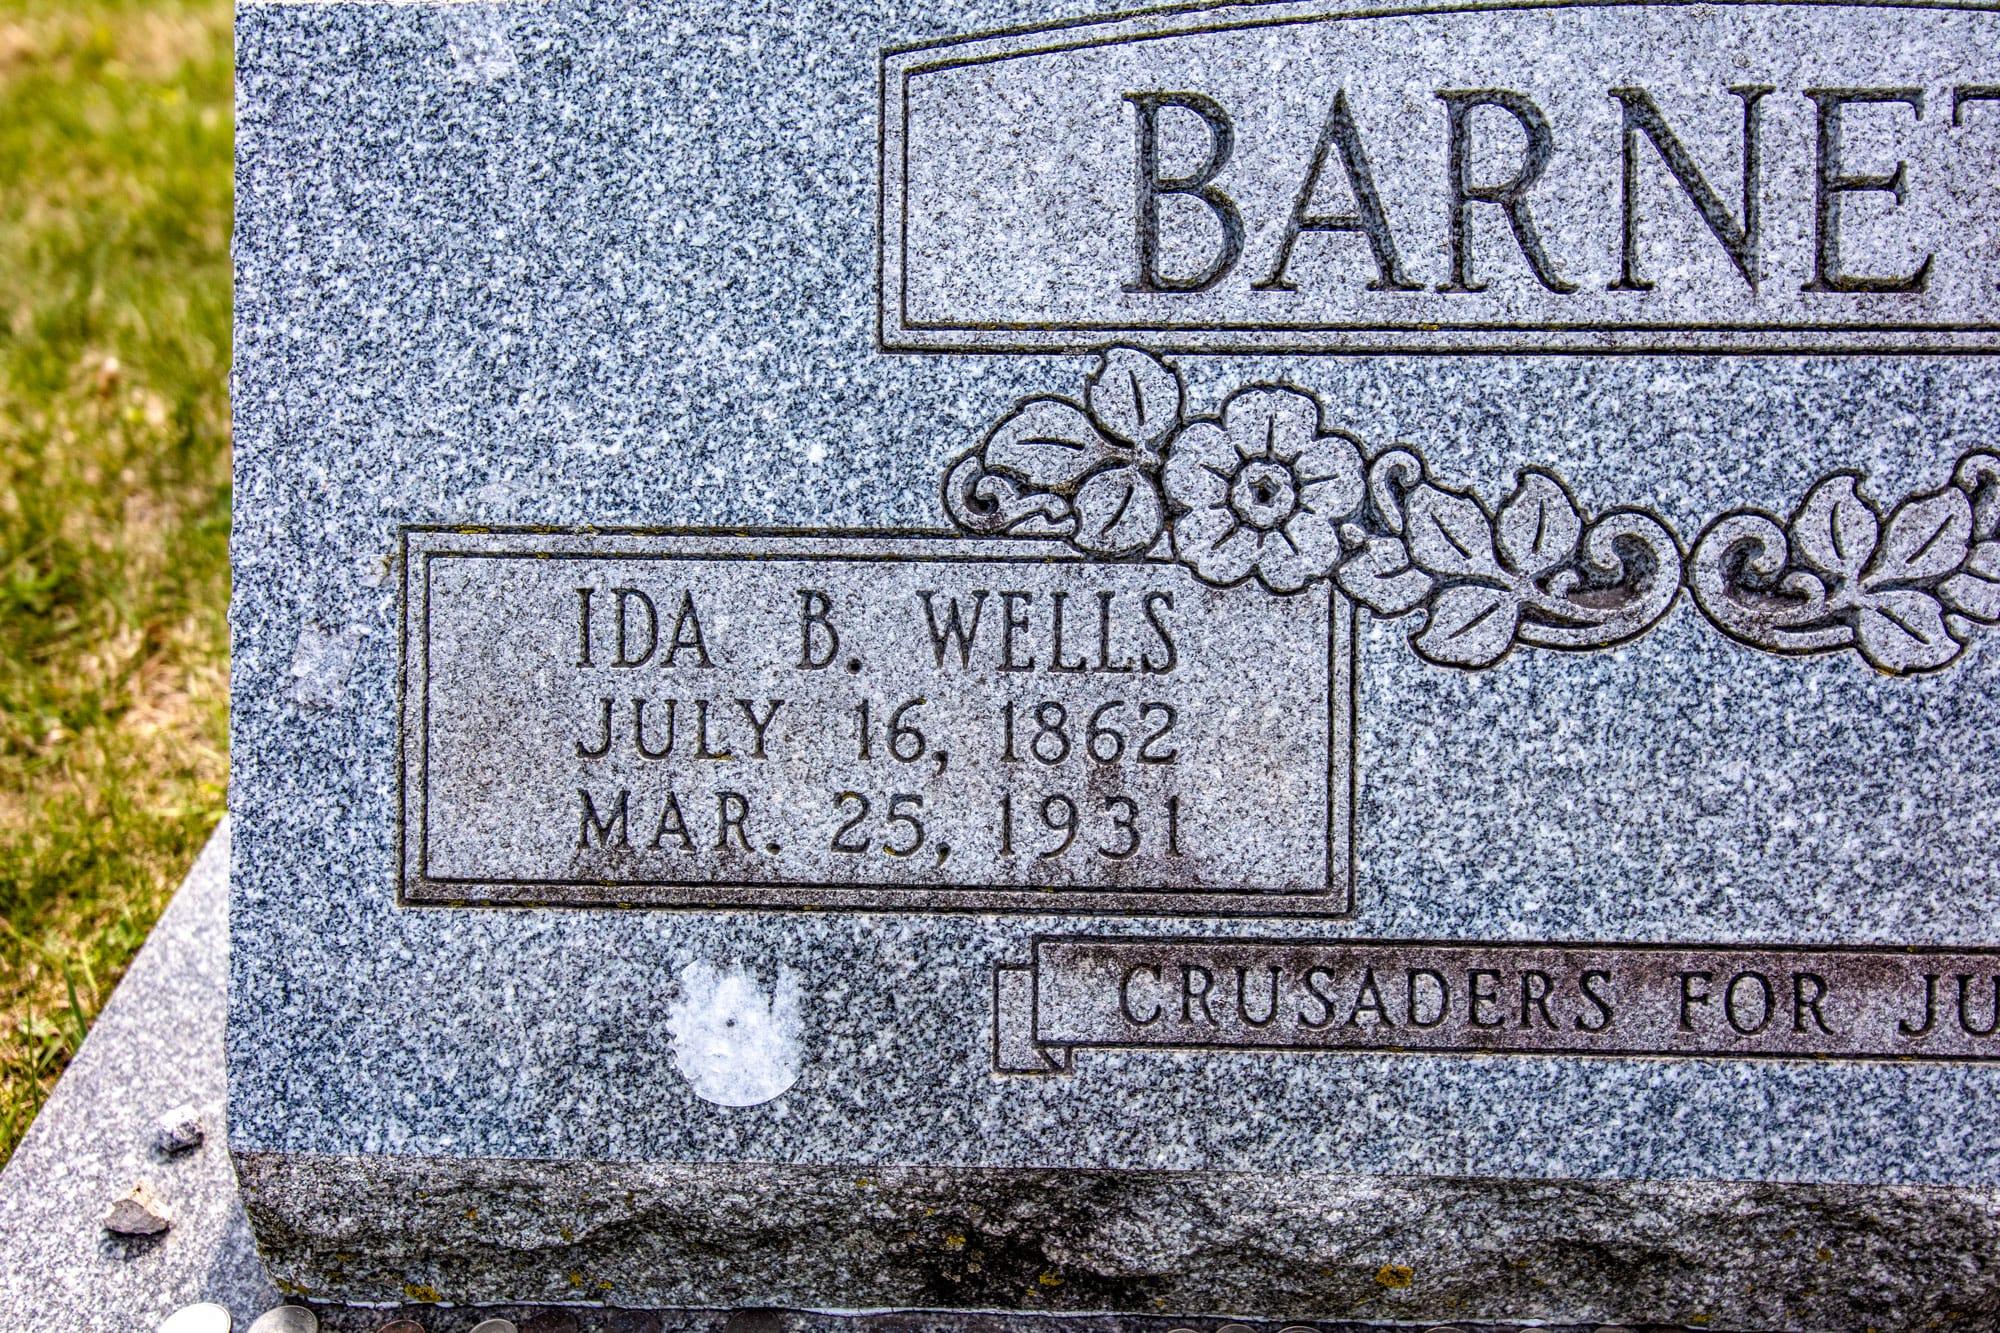 Ida B. Wells gravestone